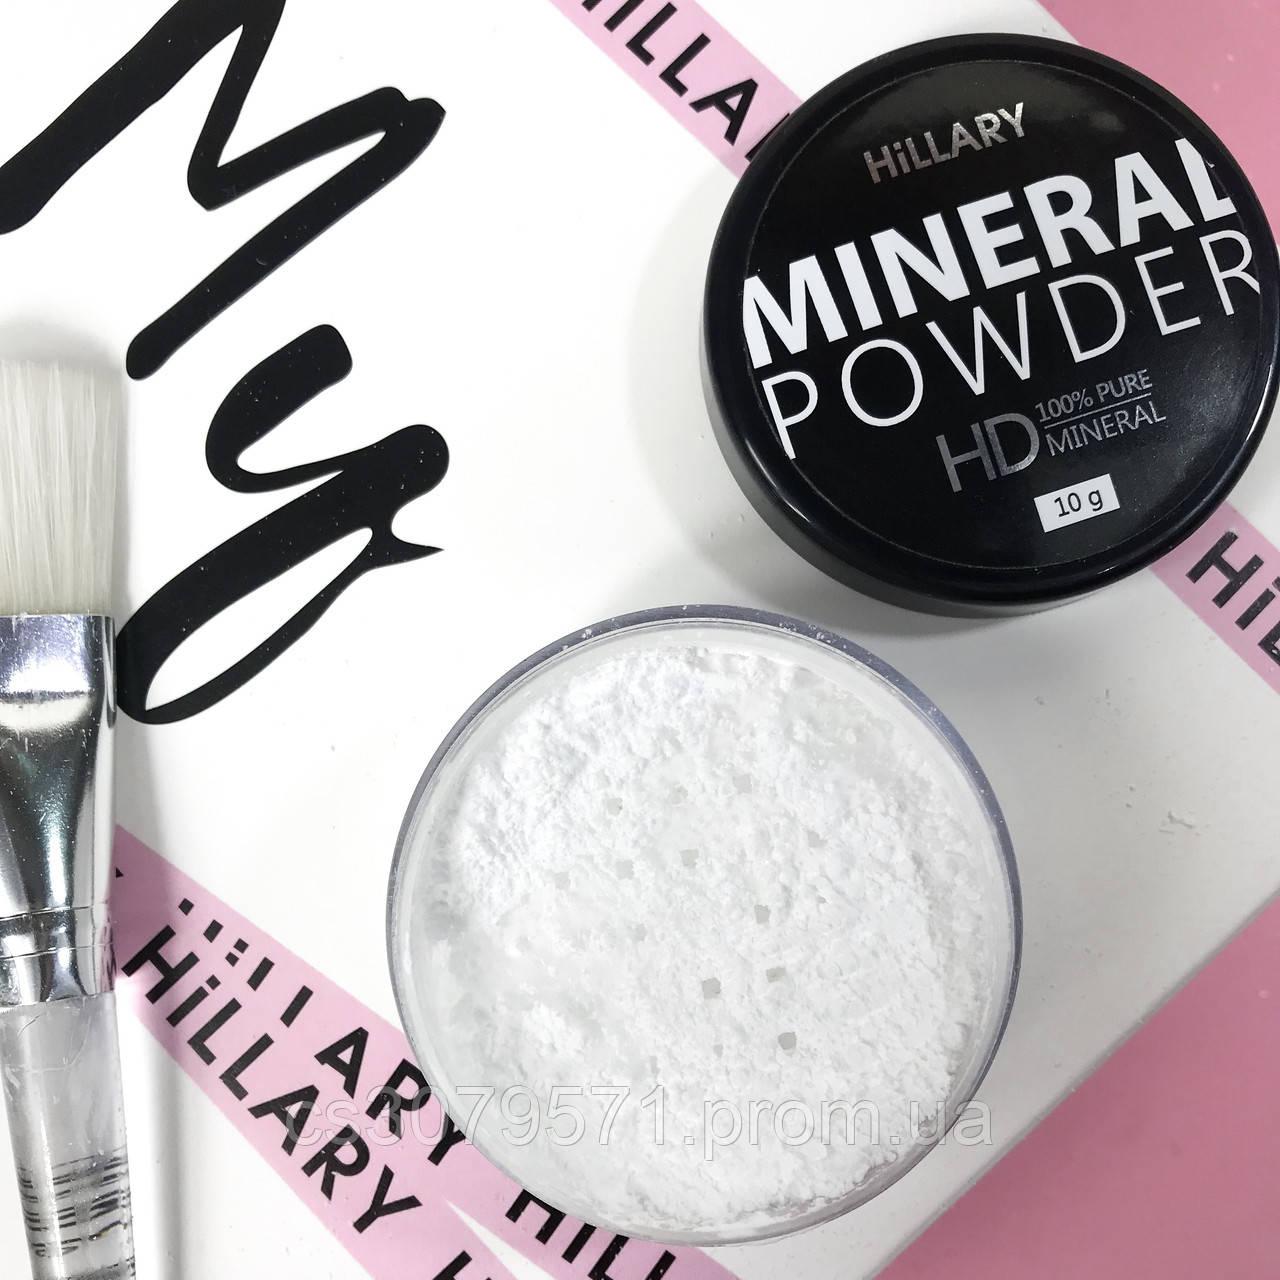 Минеральная пудра Mineral Powder HD 10g Hillary